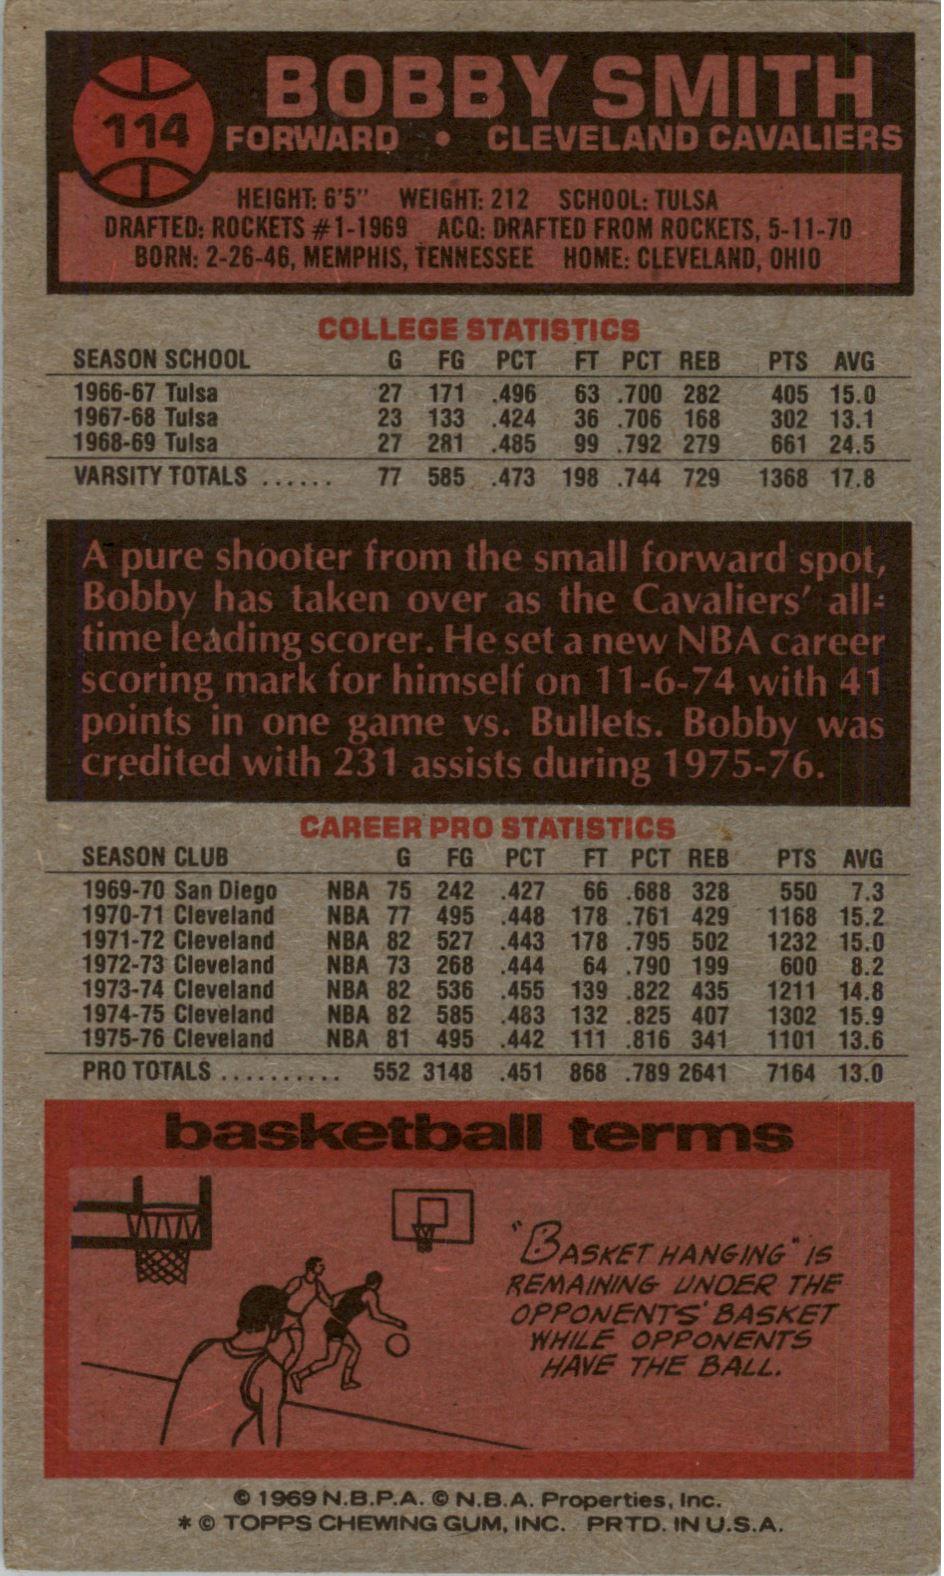 1976-77 Topps #114 Bobby Smith back image